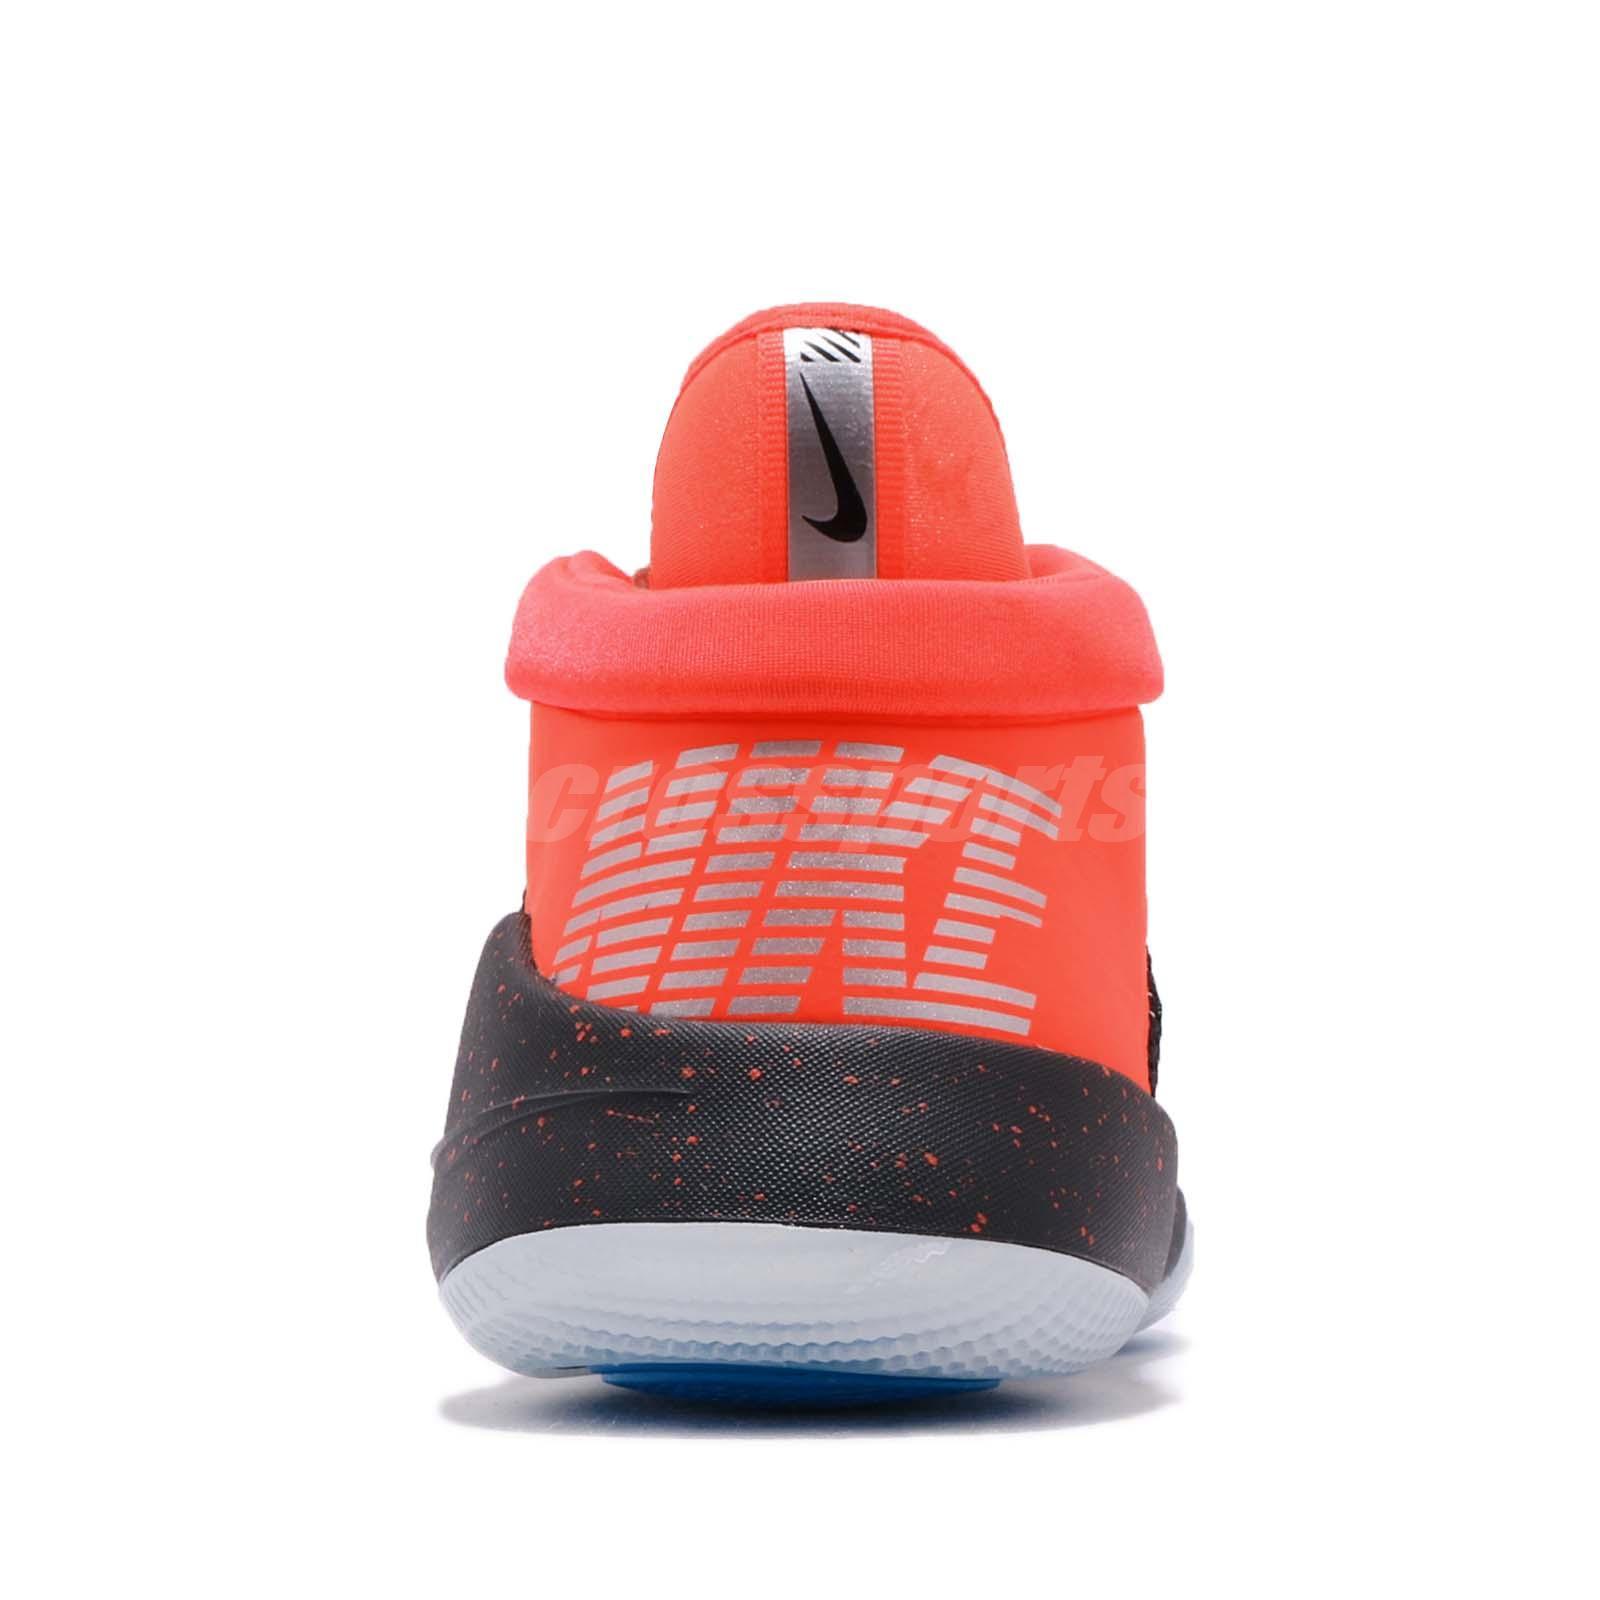 e1d5e293732441 Nike Future Flight GS Black Crimson Kid Youth Women Basketball Shoes ...